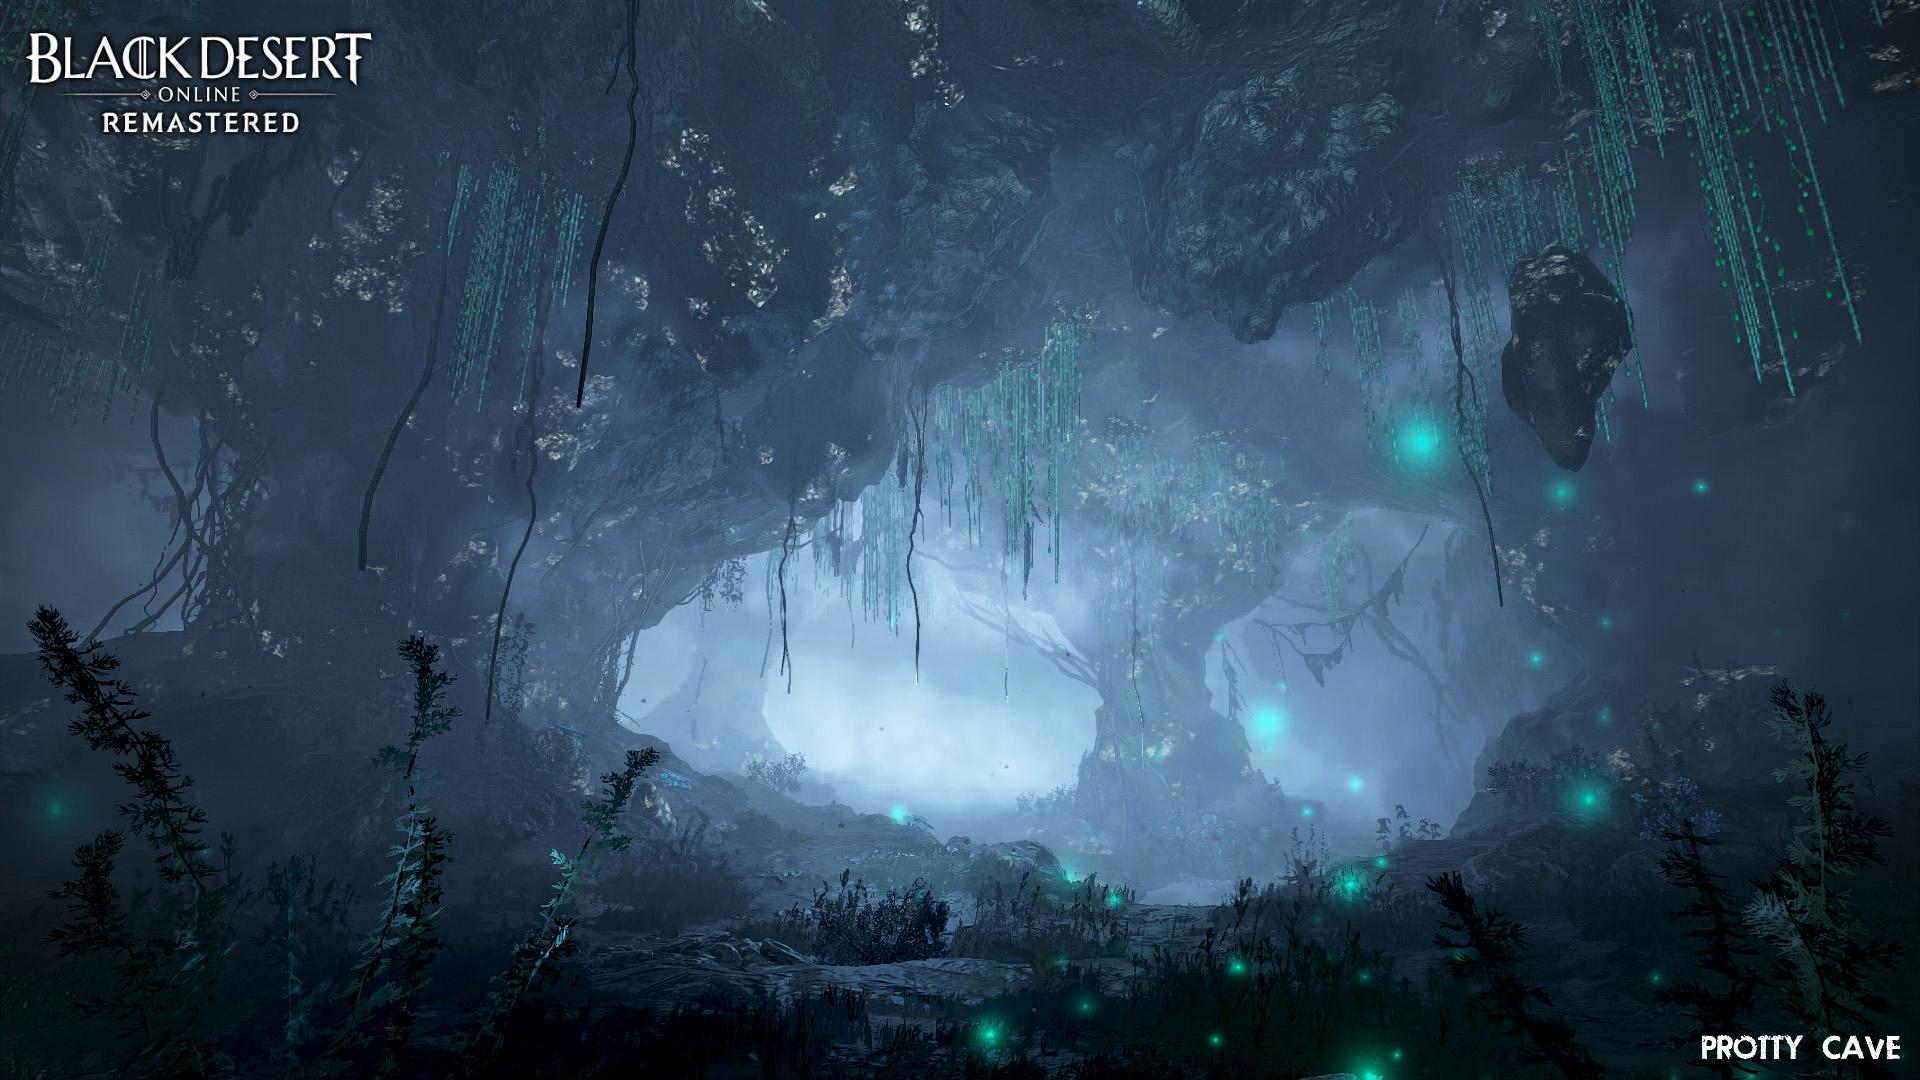 Black Desert Online Protty Cave screenshot 1